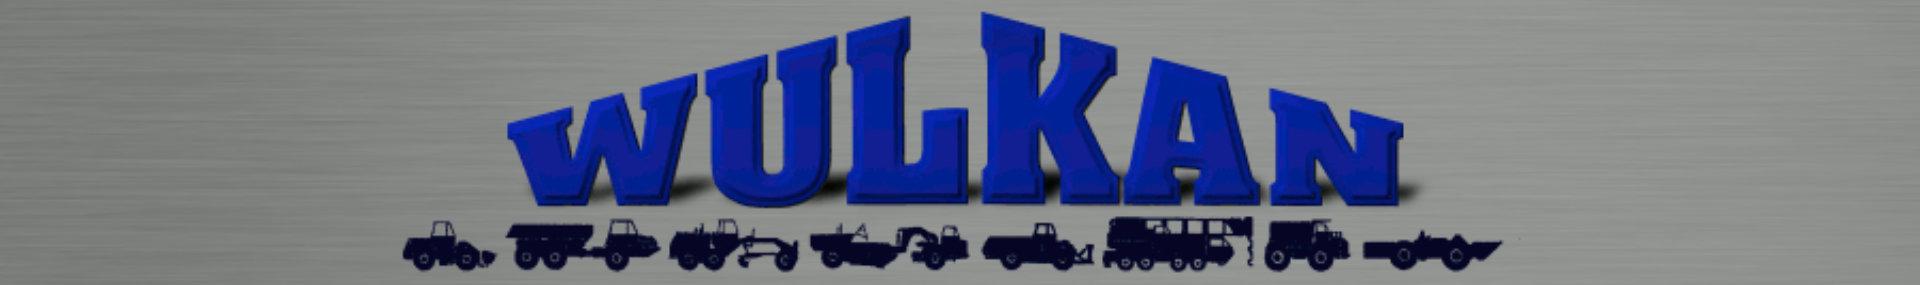 wulkan logo